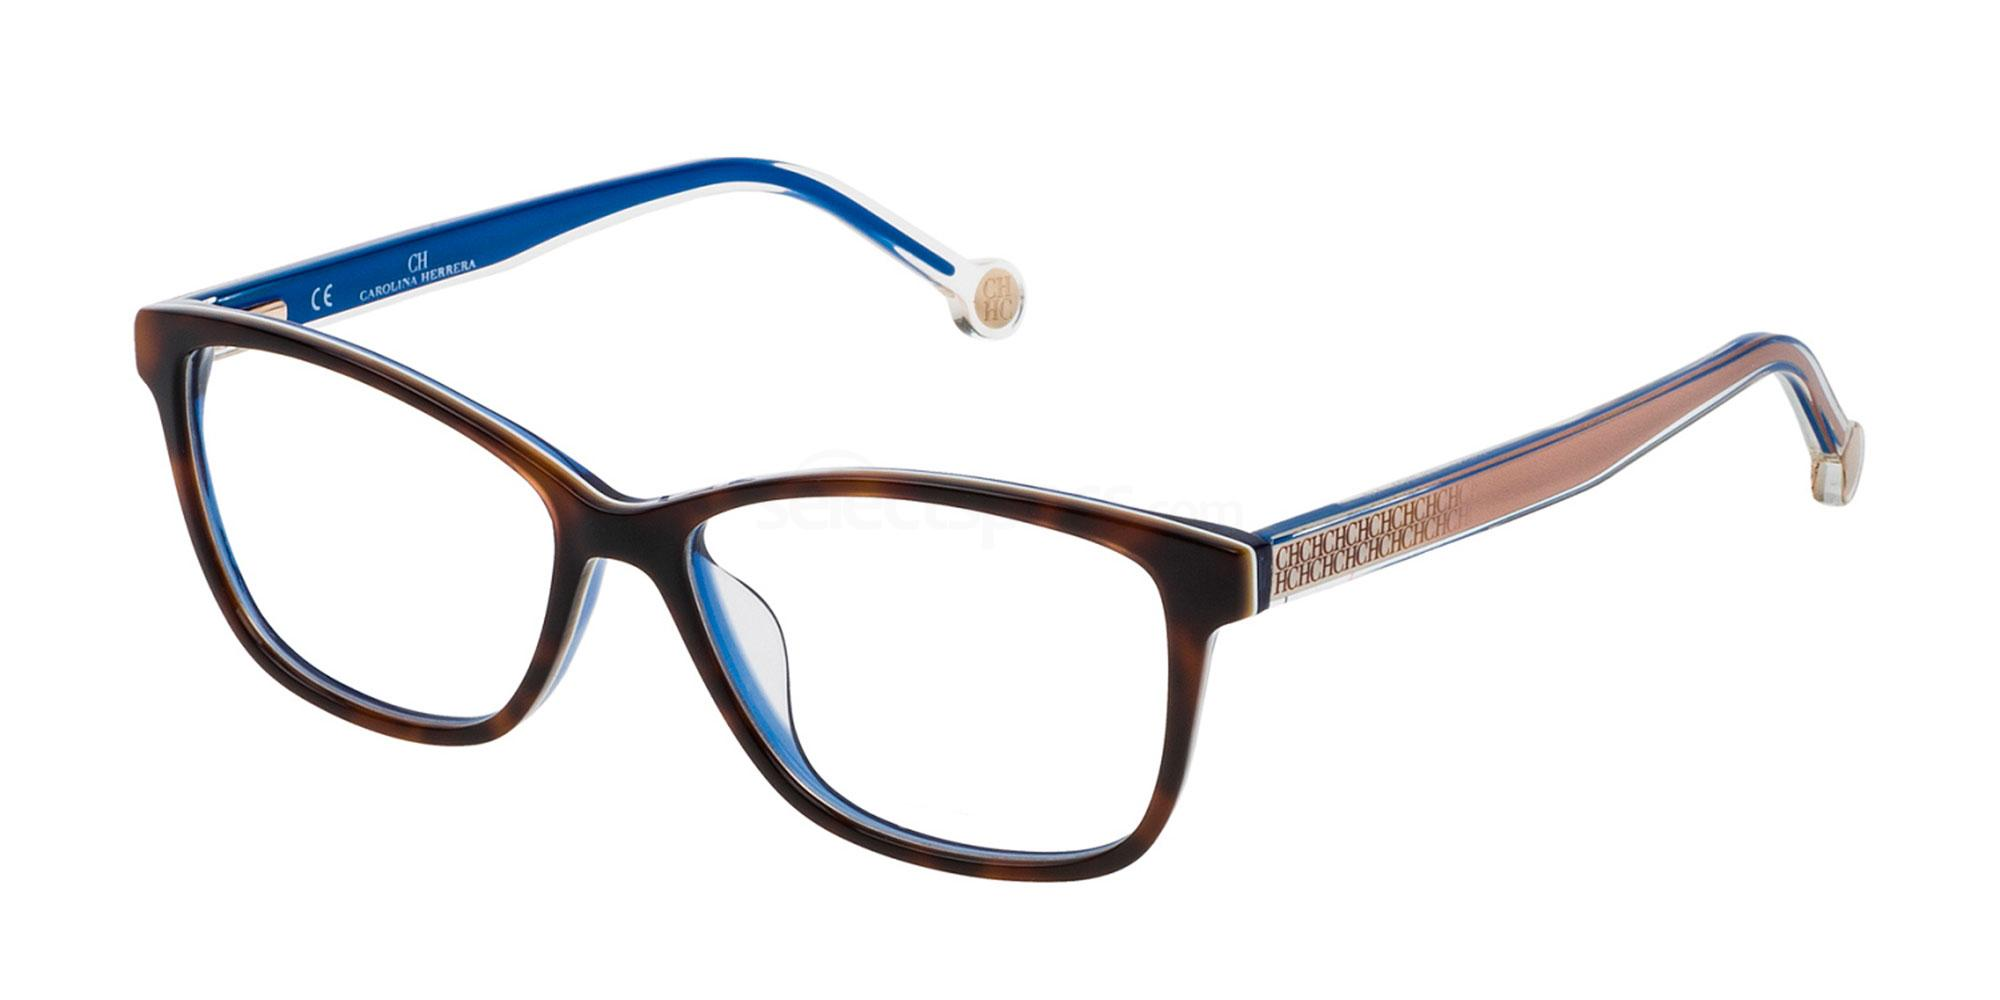 0V35 VHE723 Glasses, CH Carolina Herrera